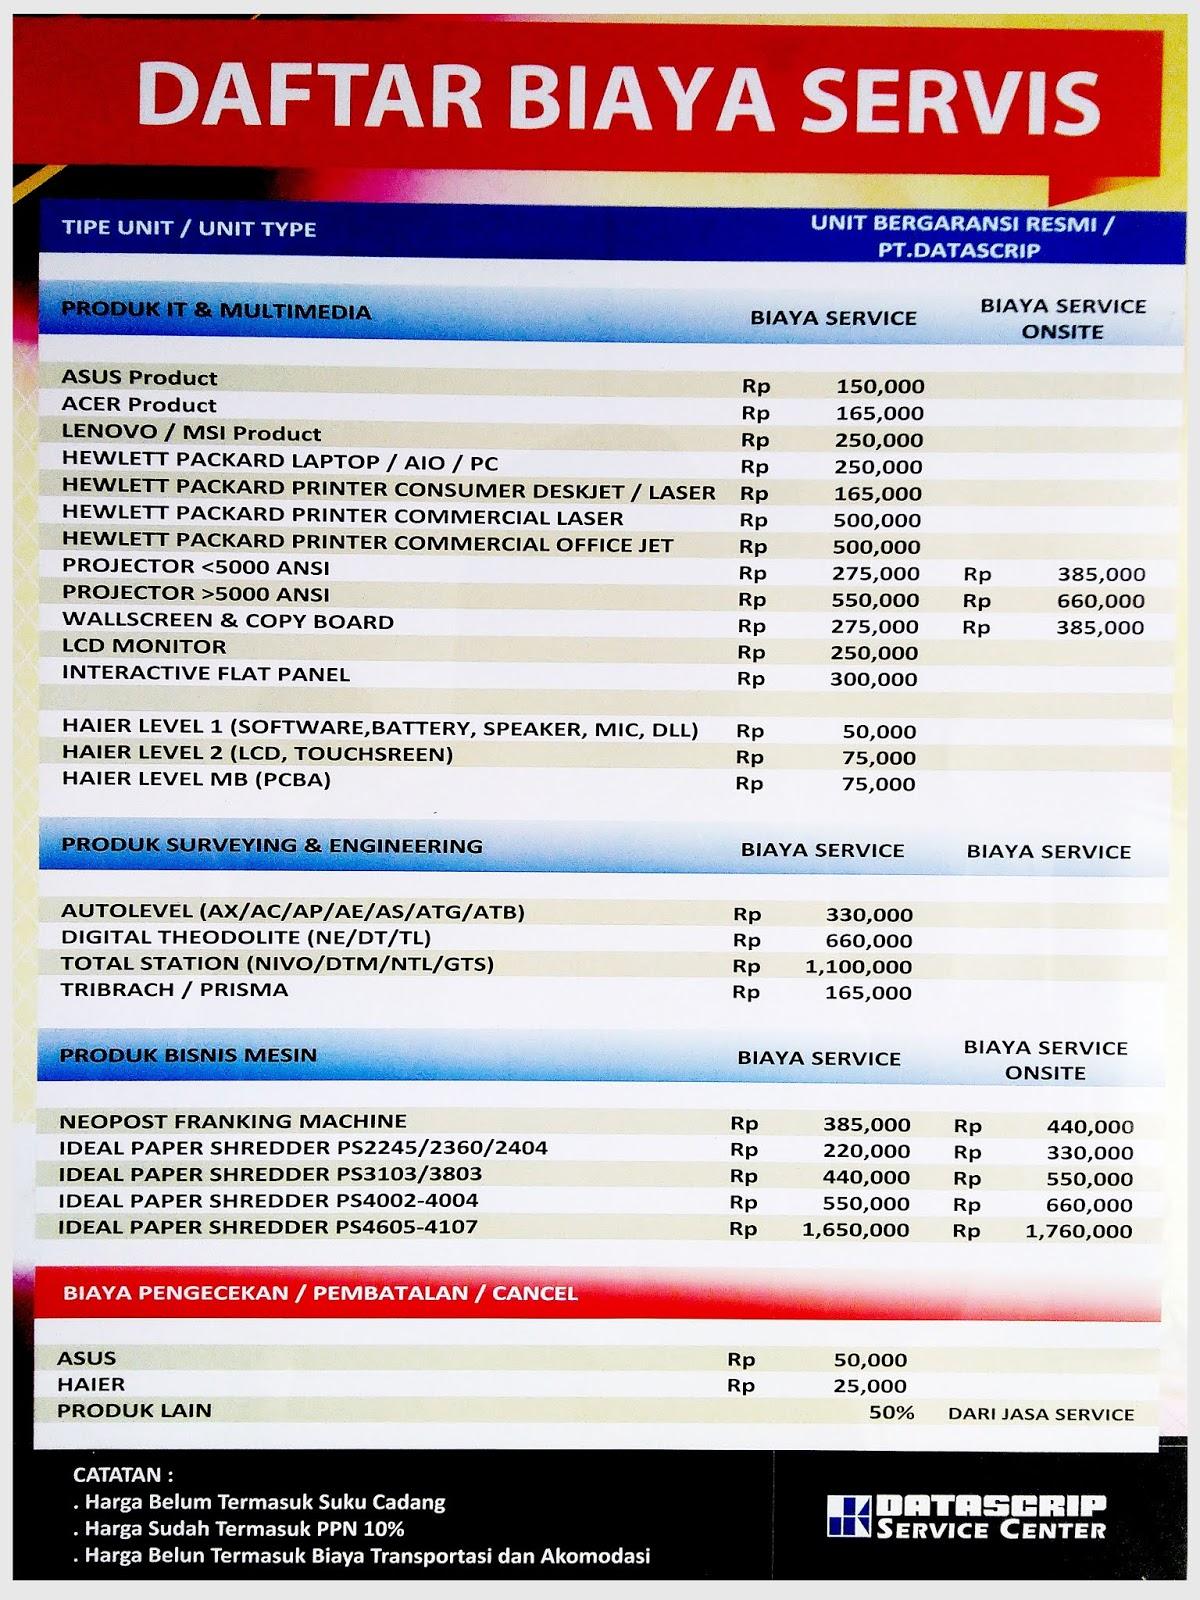 ASUS Authorized Service Partner Bekasi | Service Center